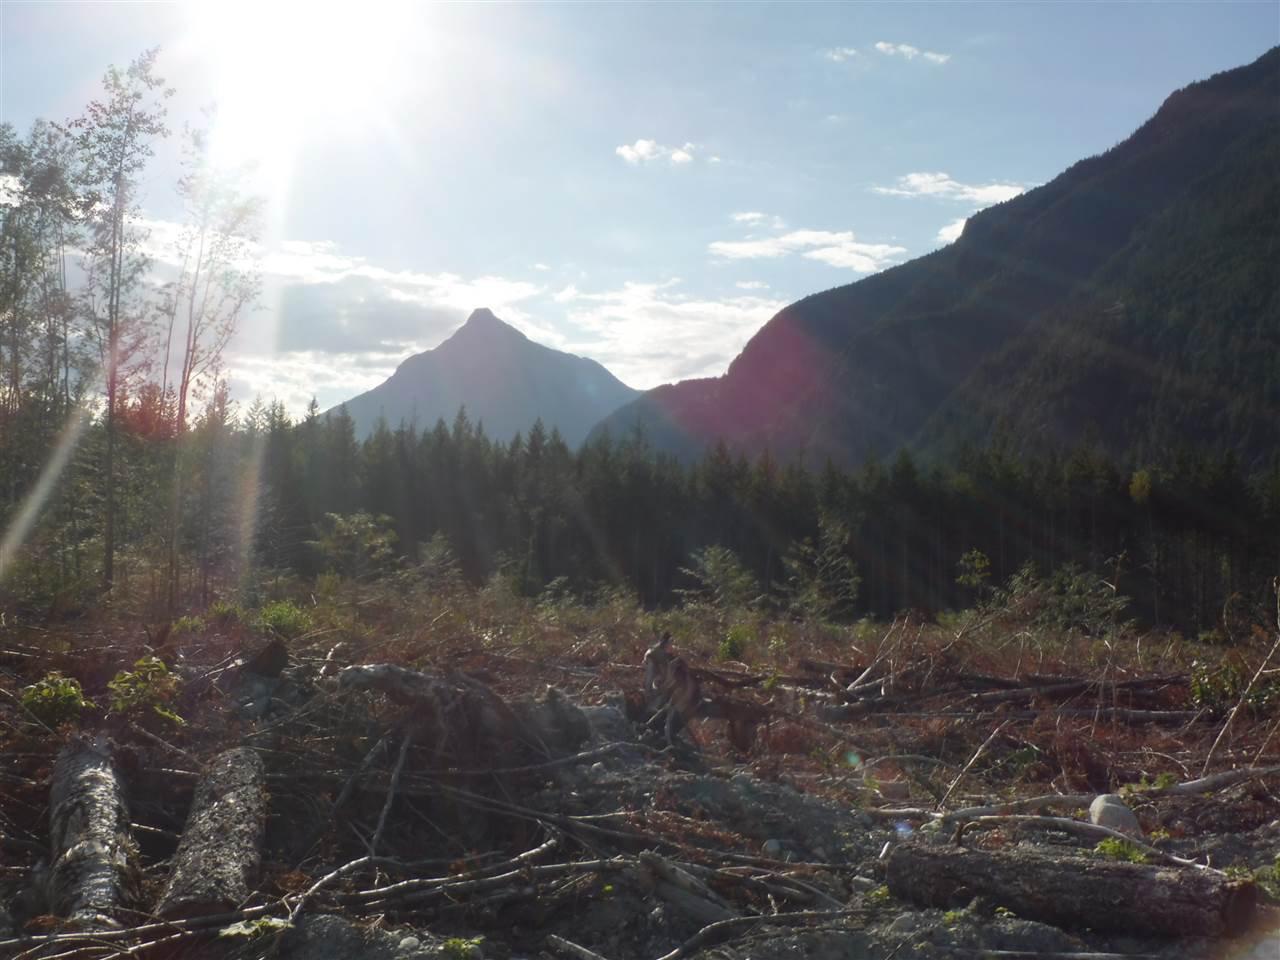 Photo 9: Photos: 3975 EAST HAMMER Road in Bella Coola: Bella Coola/Hagensborg Land for sale (Williams Lake (Zone 27))  : MLS®# R2483527